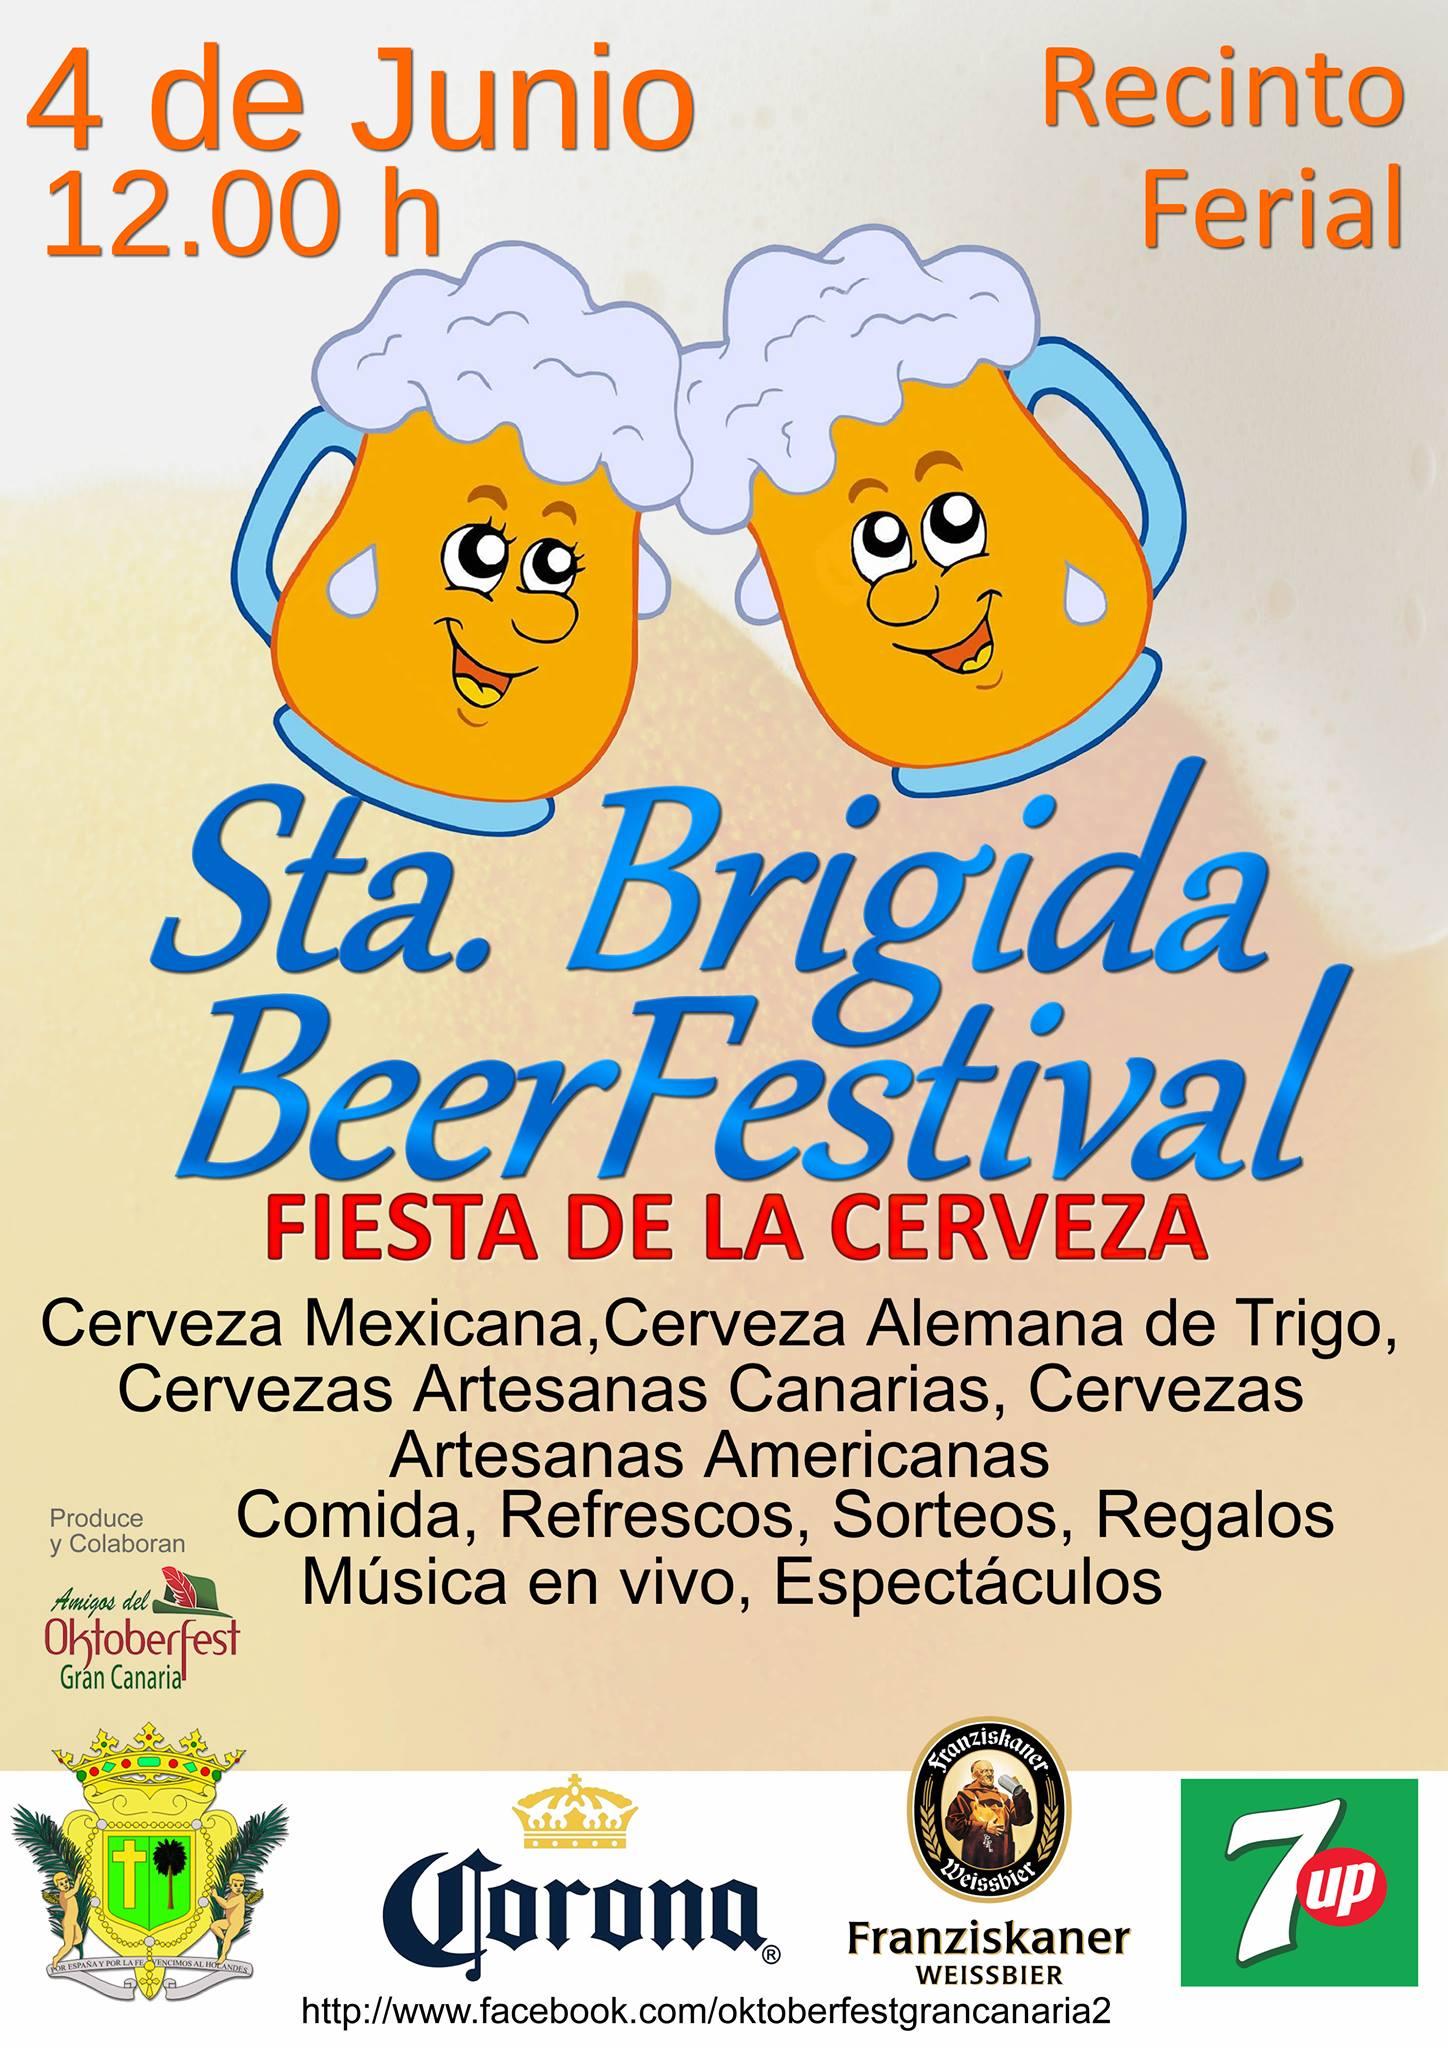 Festival de la cerveza santa brigida 2016